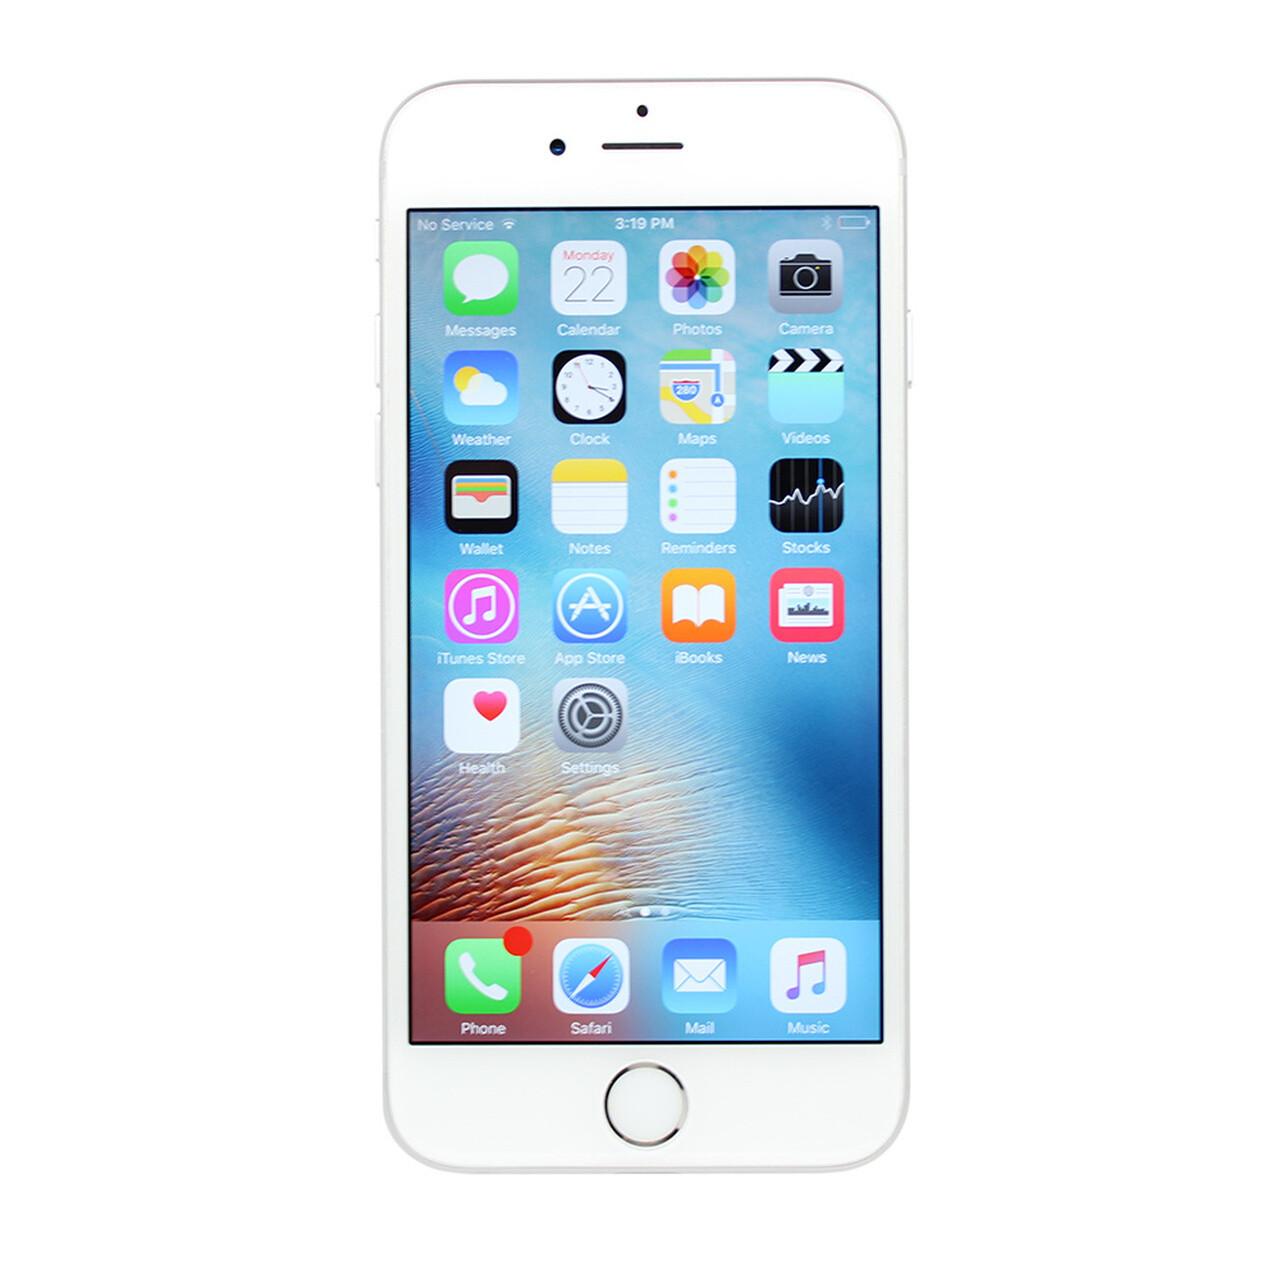 Apple iPhone 6s Plus a1687 128GB Unlocked -Very Good